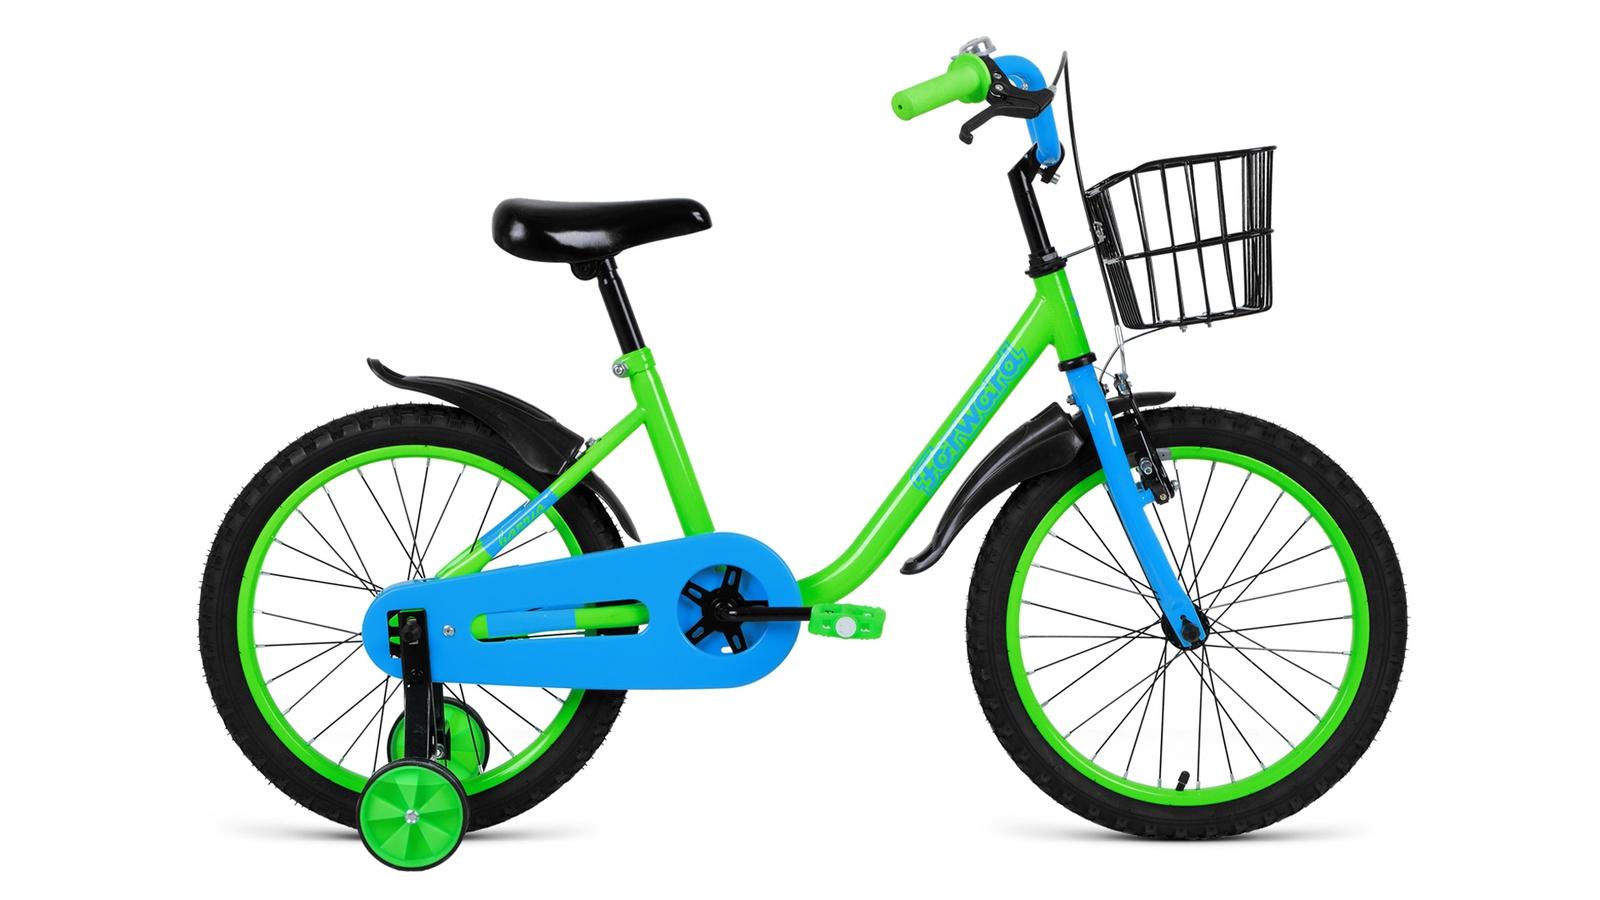 Велосипед Forward Barrio 18 2019 зеленый велосипед forward barrio 14 2019